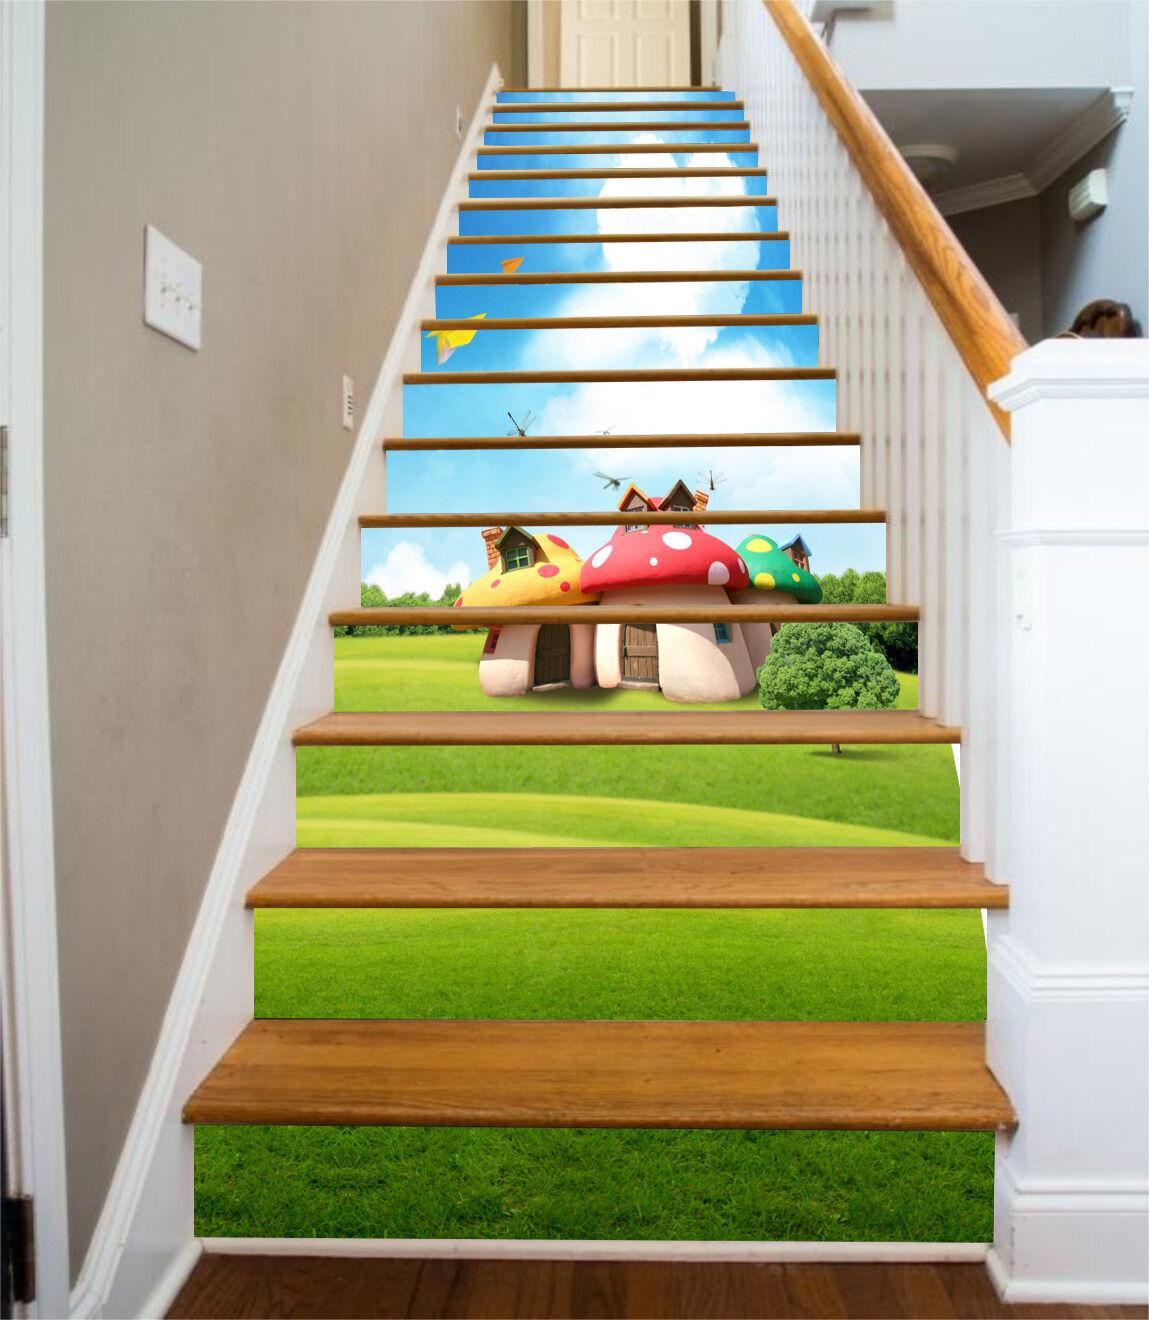 3D Sky lawn 37 Stair Risers Decoration Photo Mural Vinyl Decal WandPapier UK